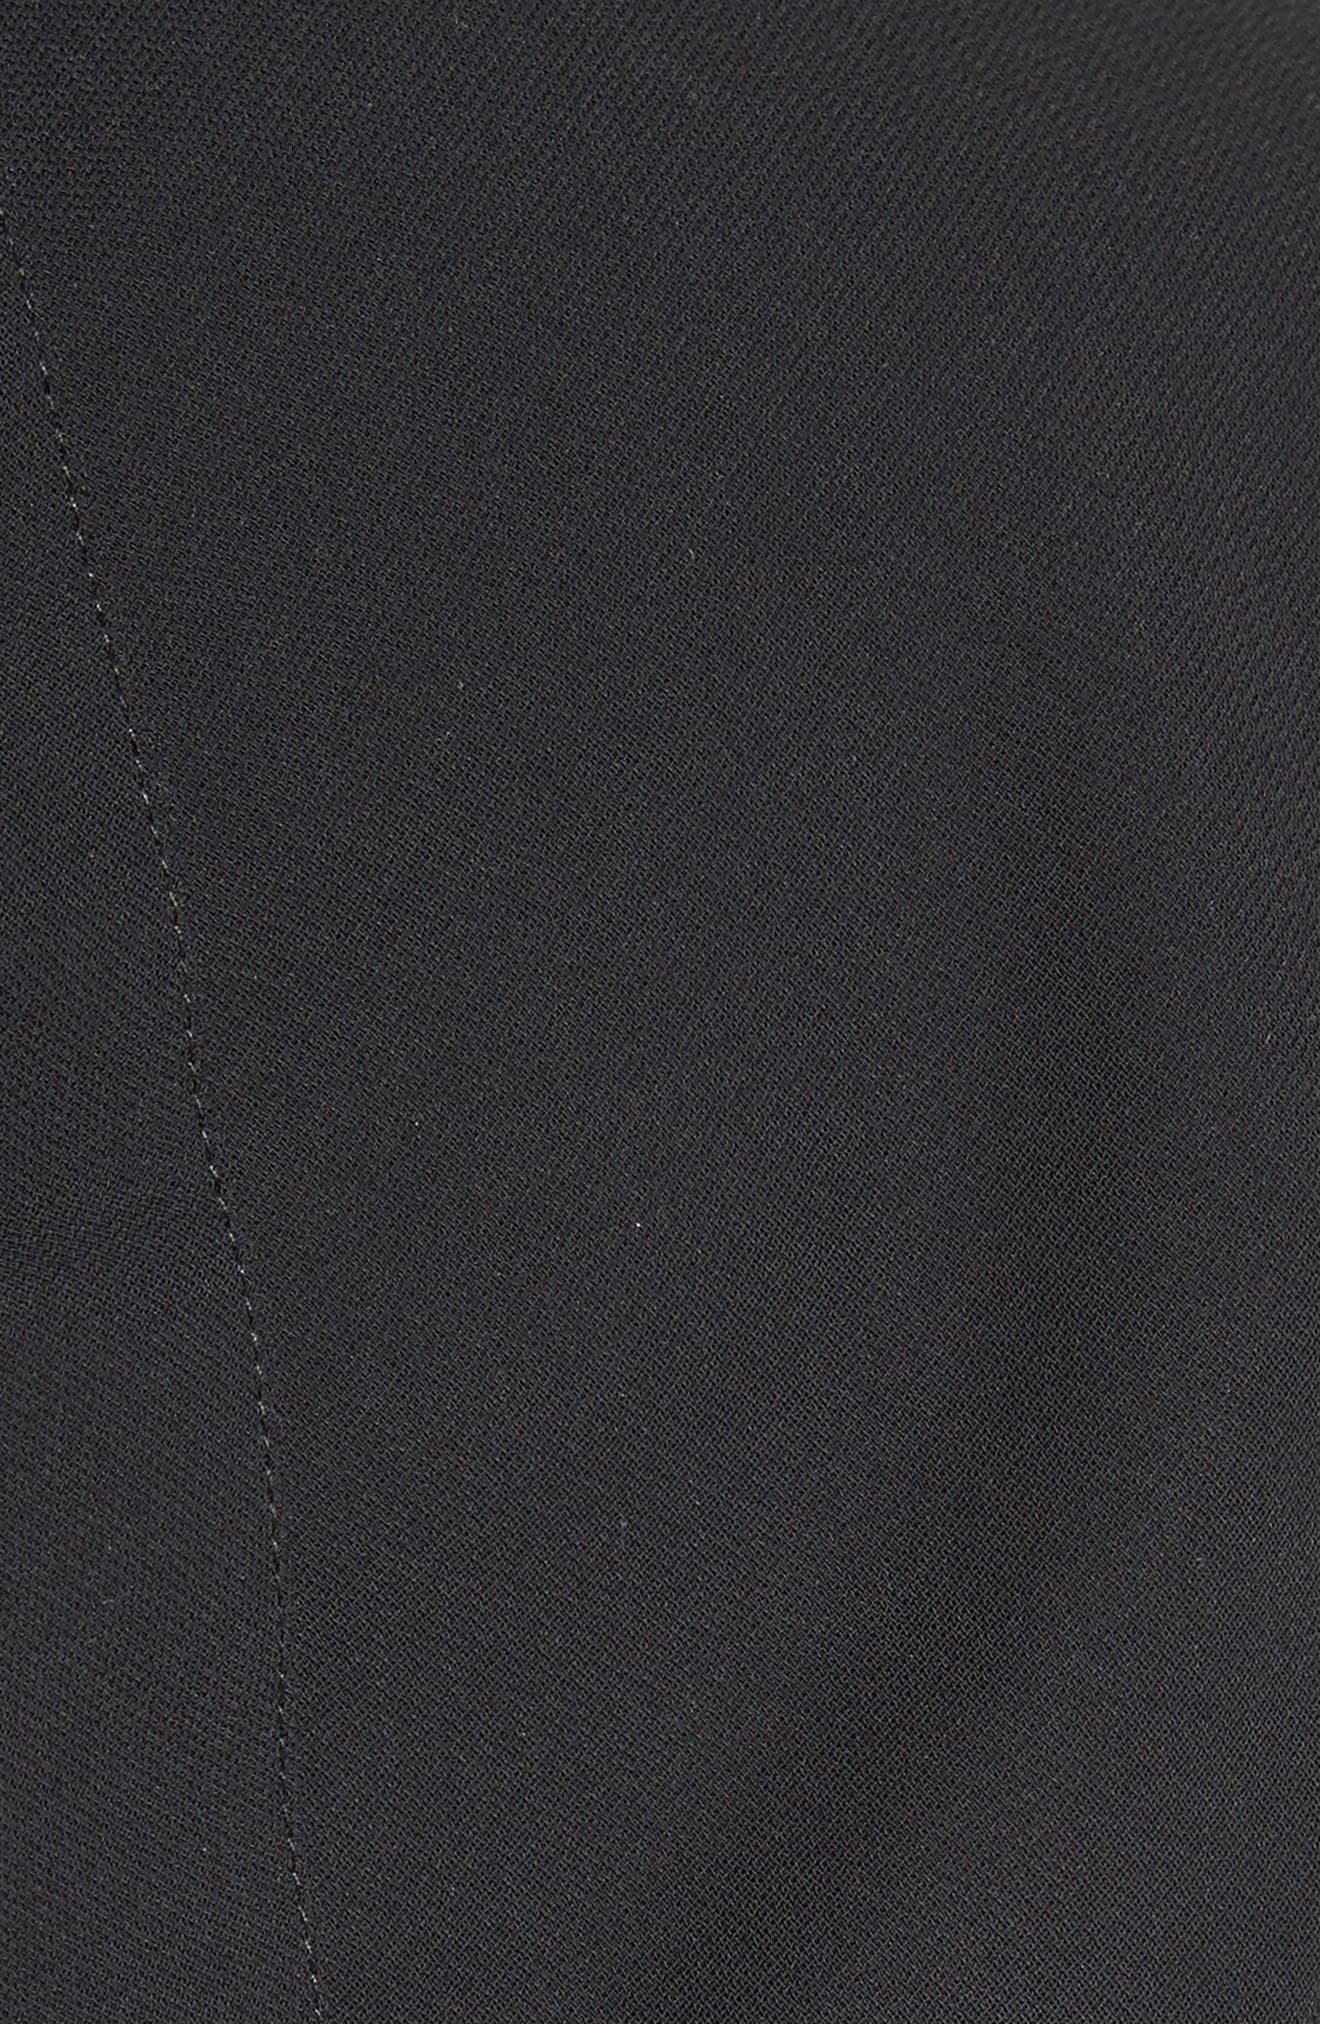 Gathered Open Back Shift Dress,                             Alternate thumbnail 5, color,                             001